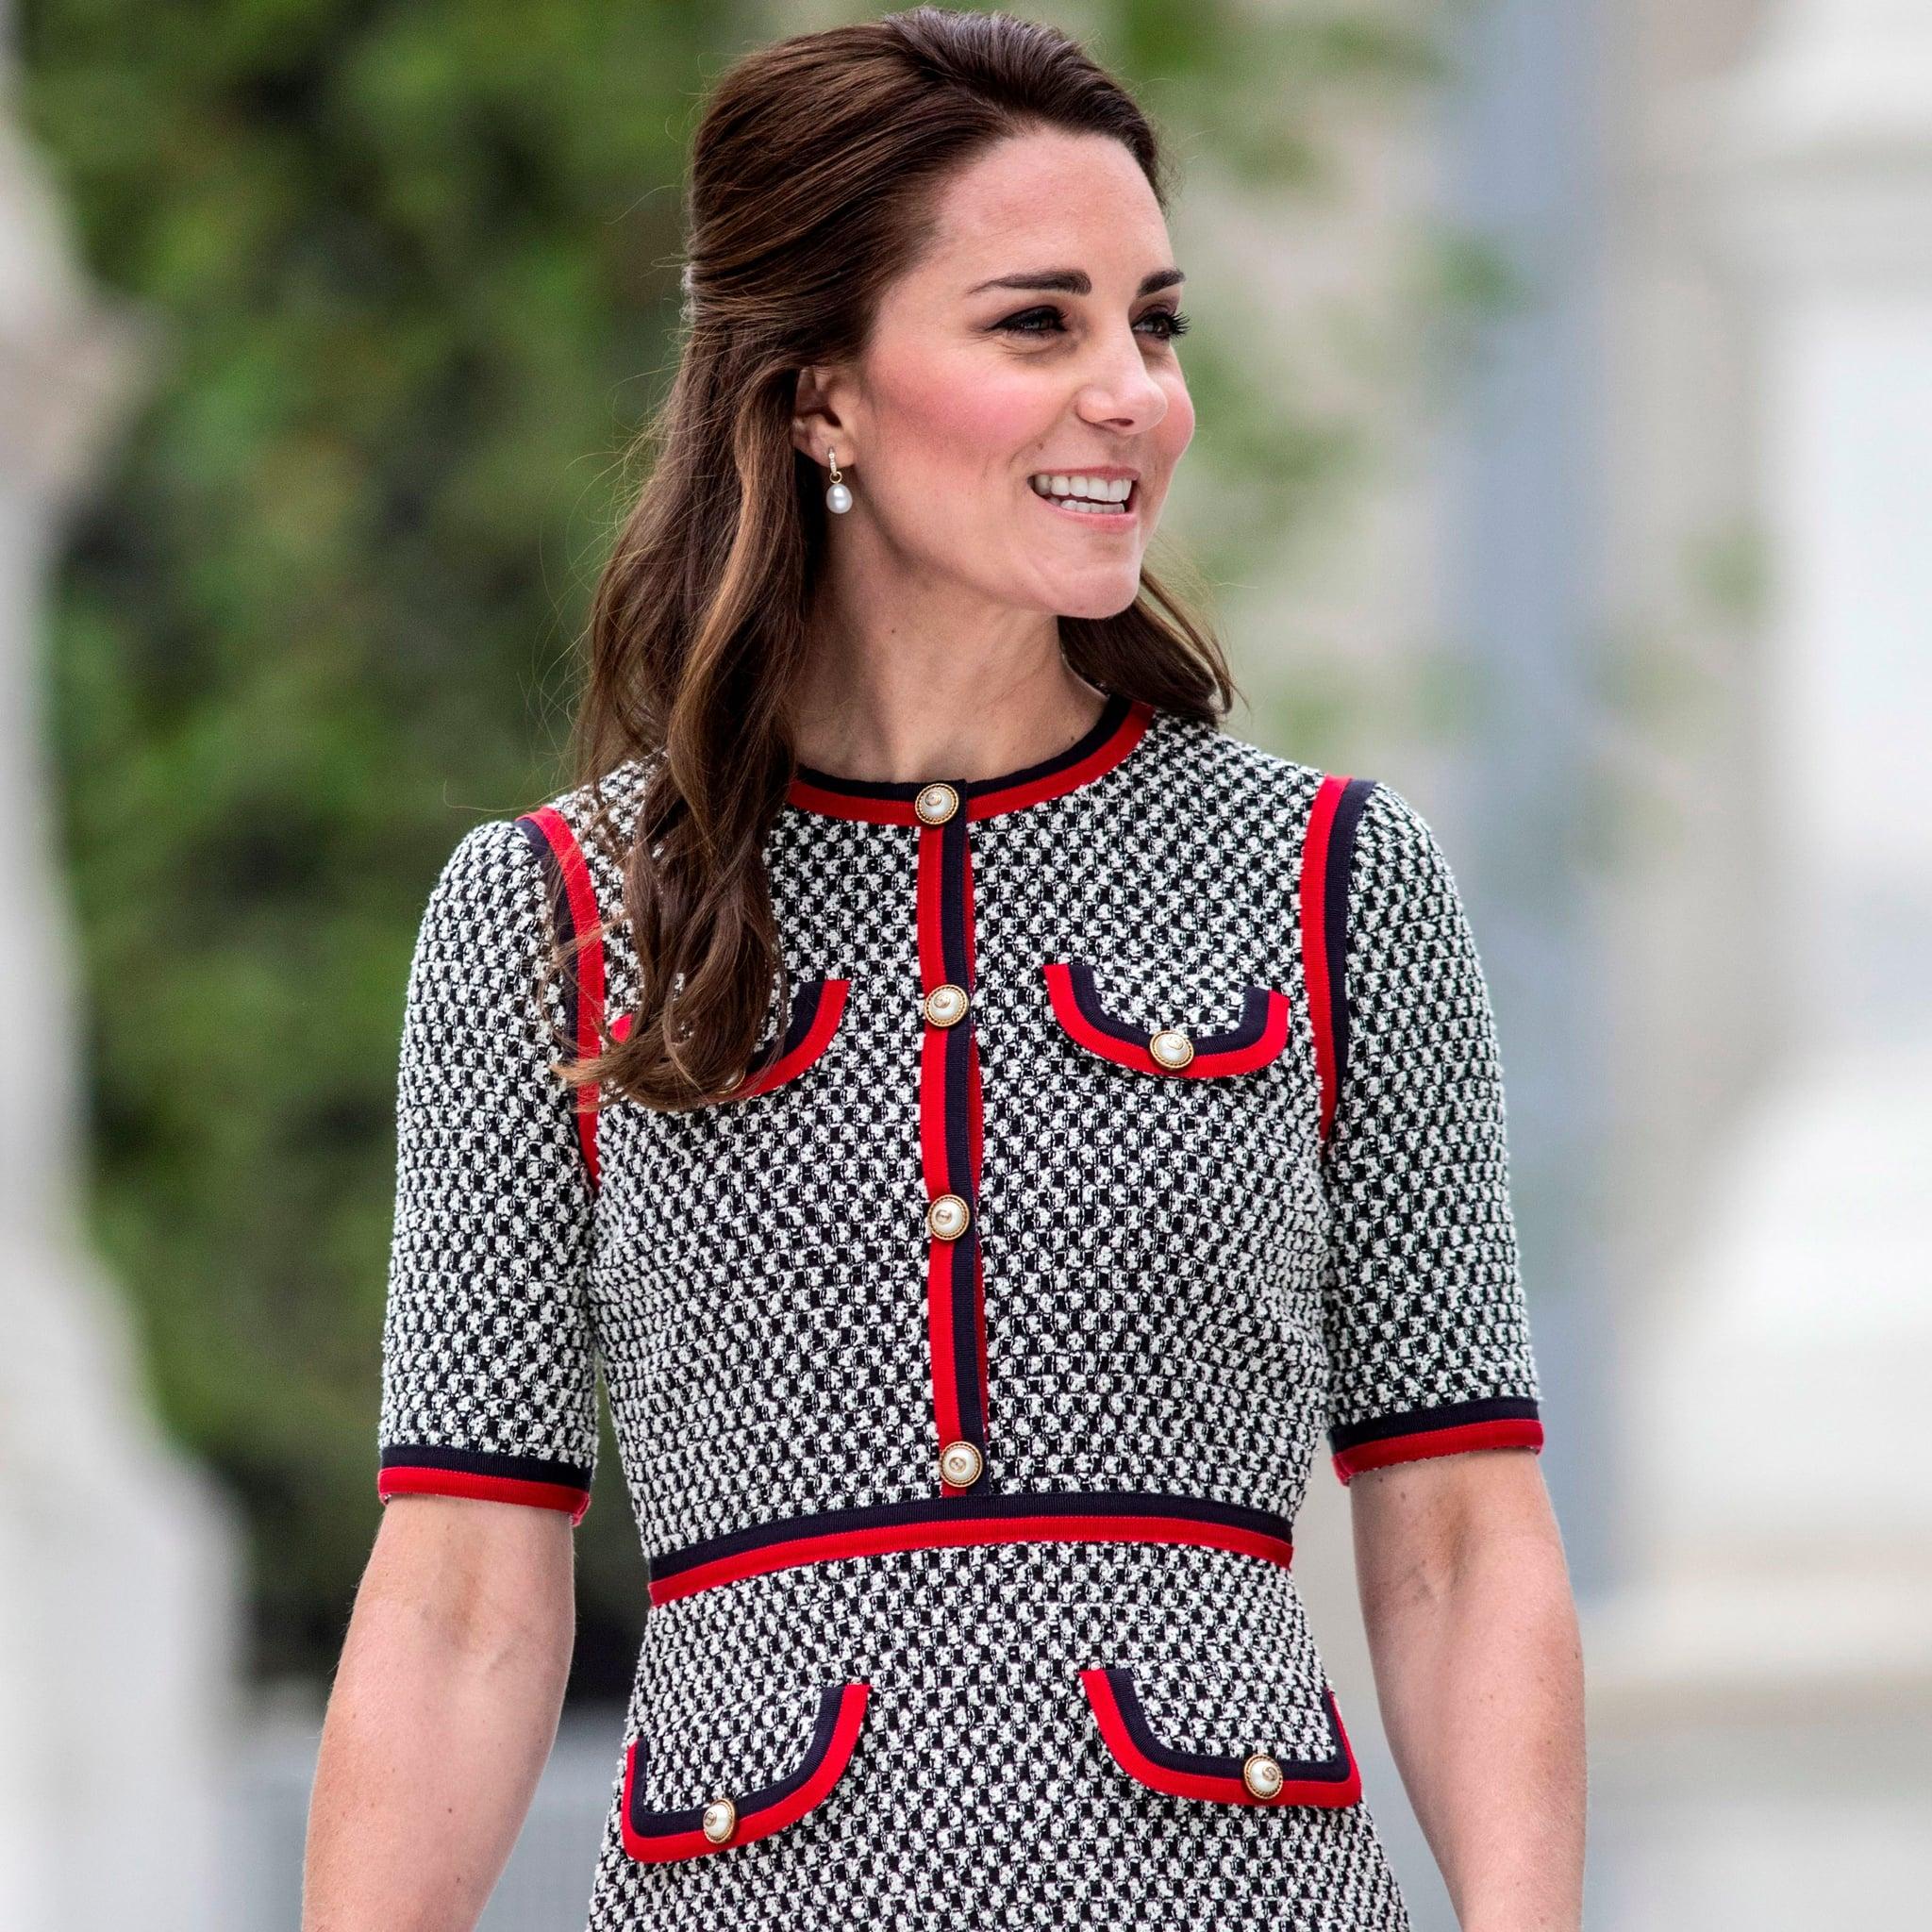 kate middleton best looks 2017 popsugar fashion kate middleton best looks 2017